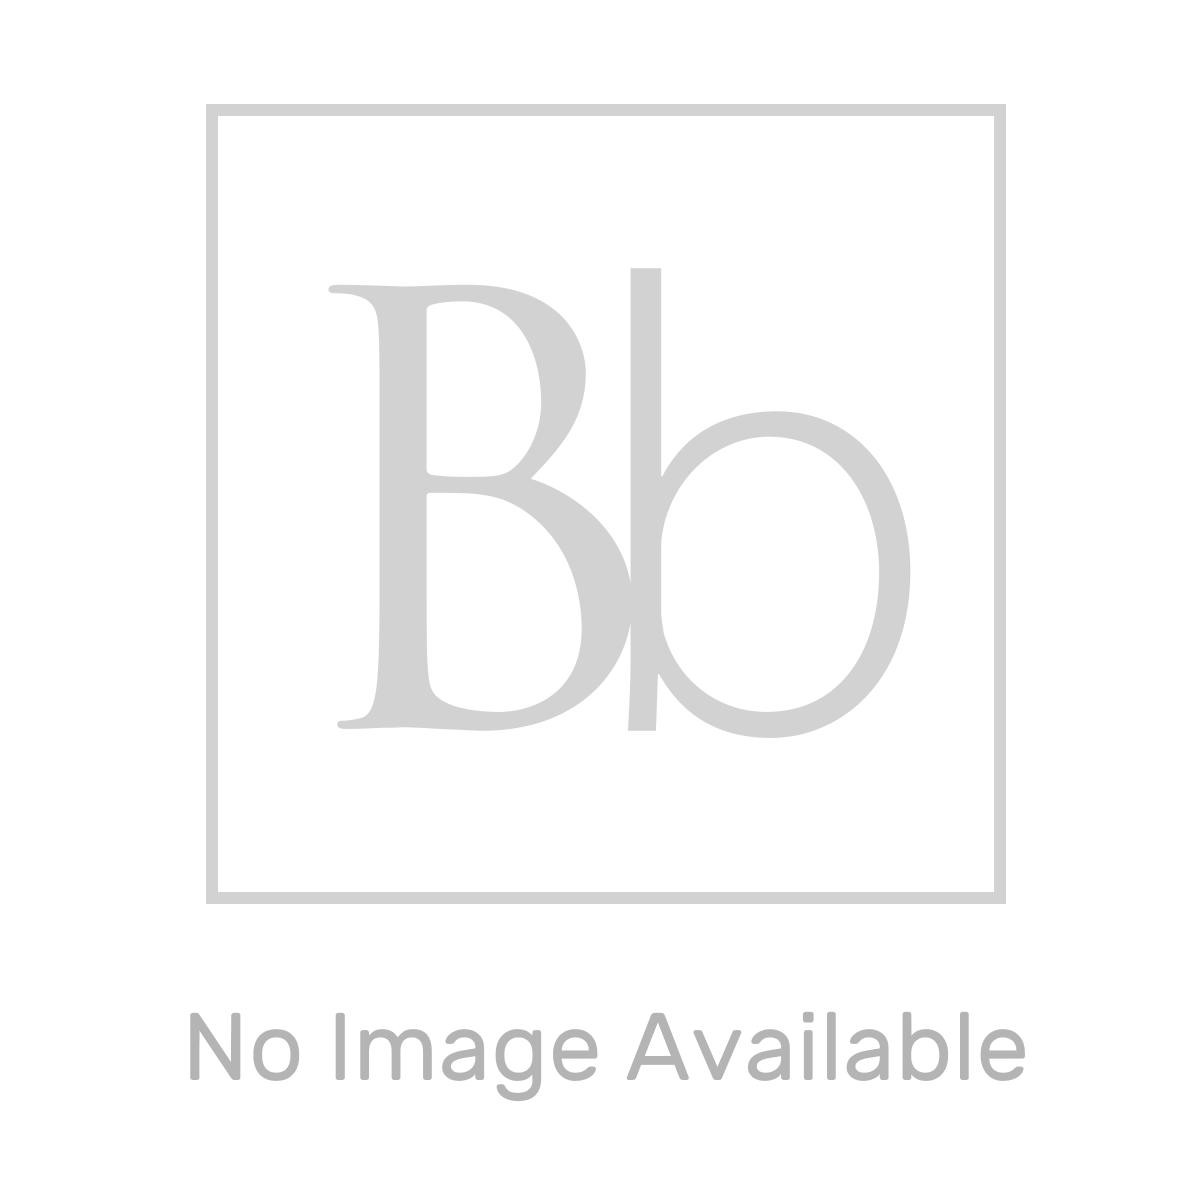 Stainless Steel Bathroom Mirror Cabinet Handle